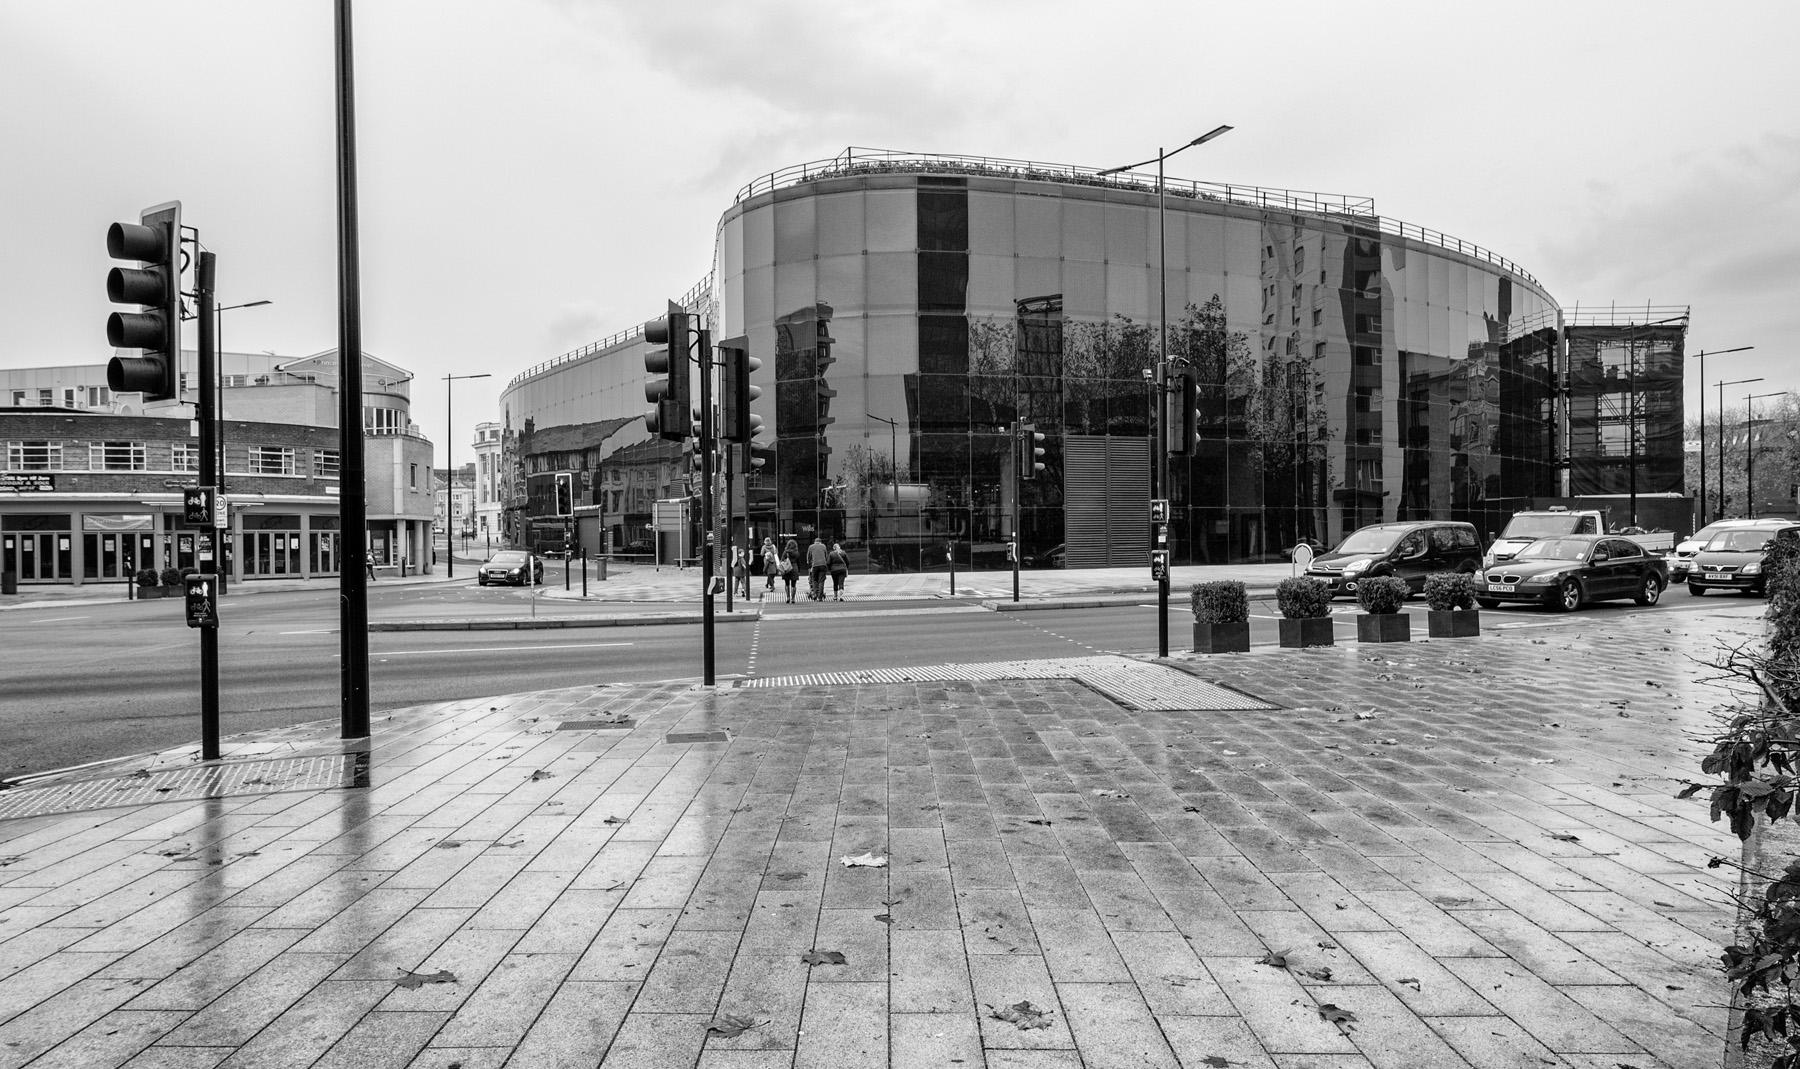 Willis building in Ipswich, 2014 road layout